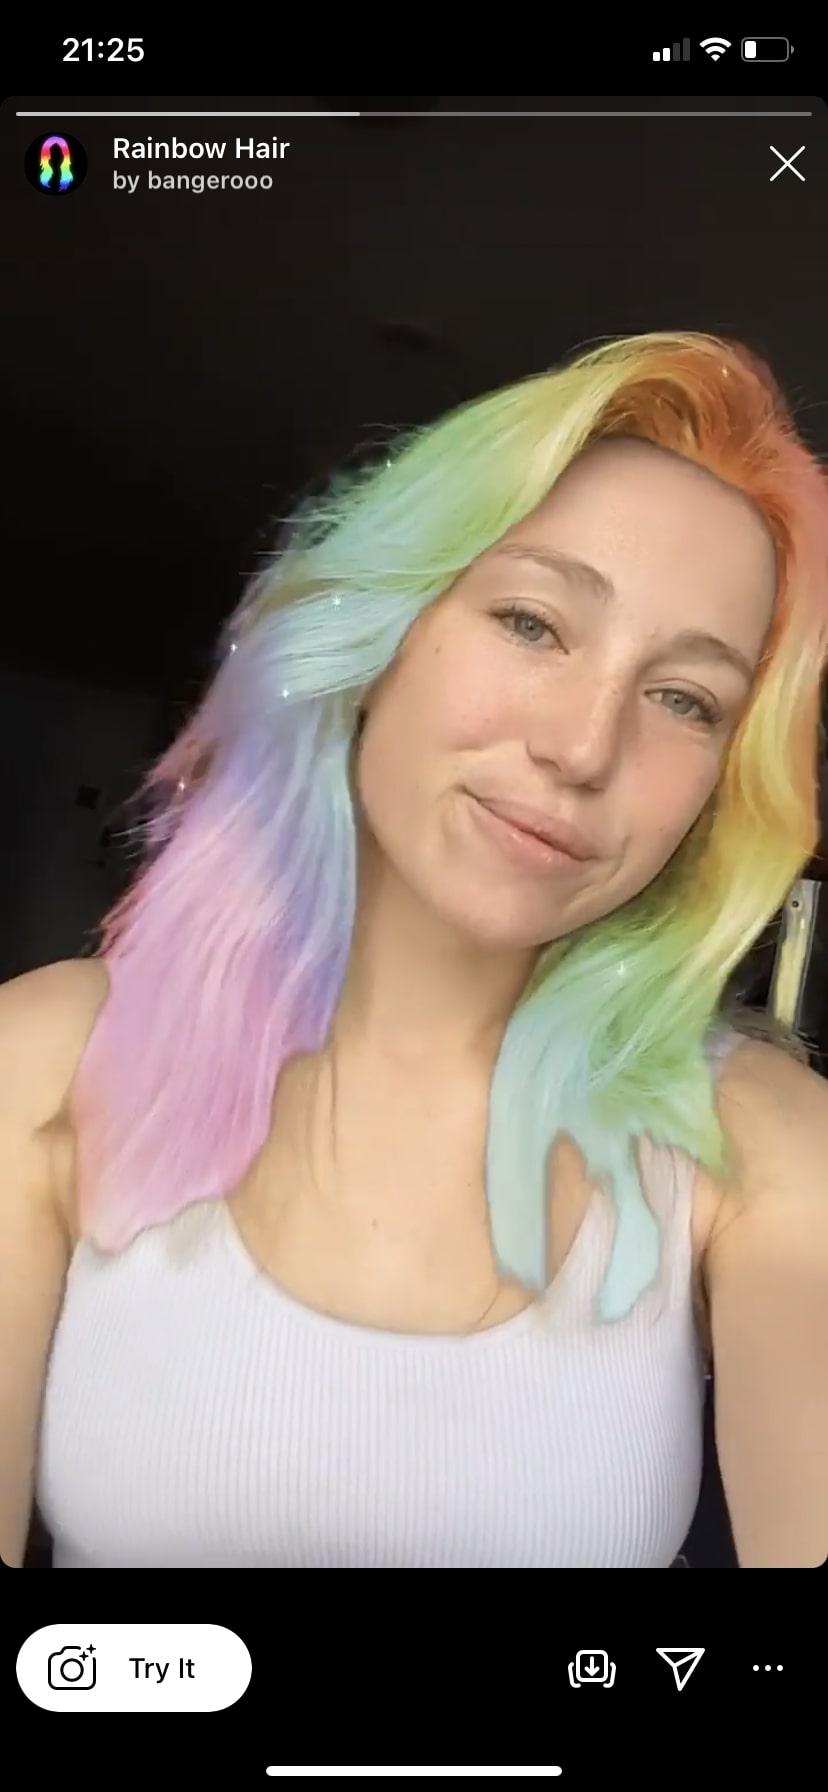 Rainbow Hair by @bangerooo hair color Instagram face filter